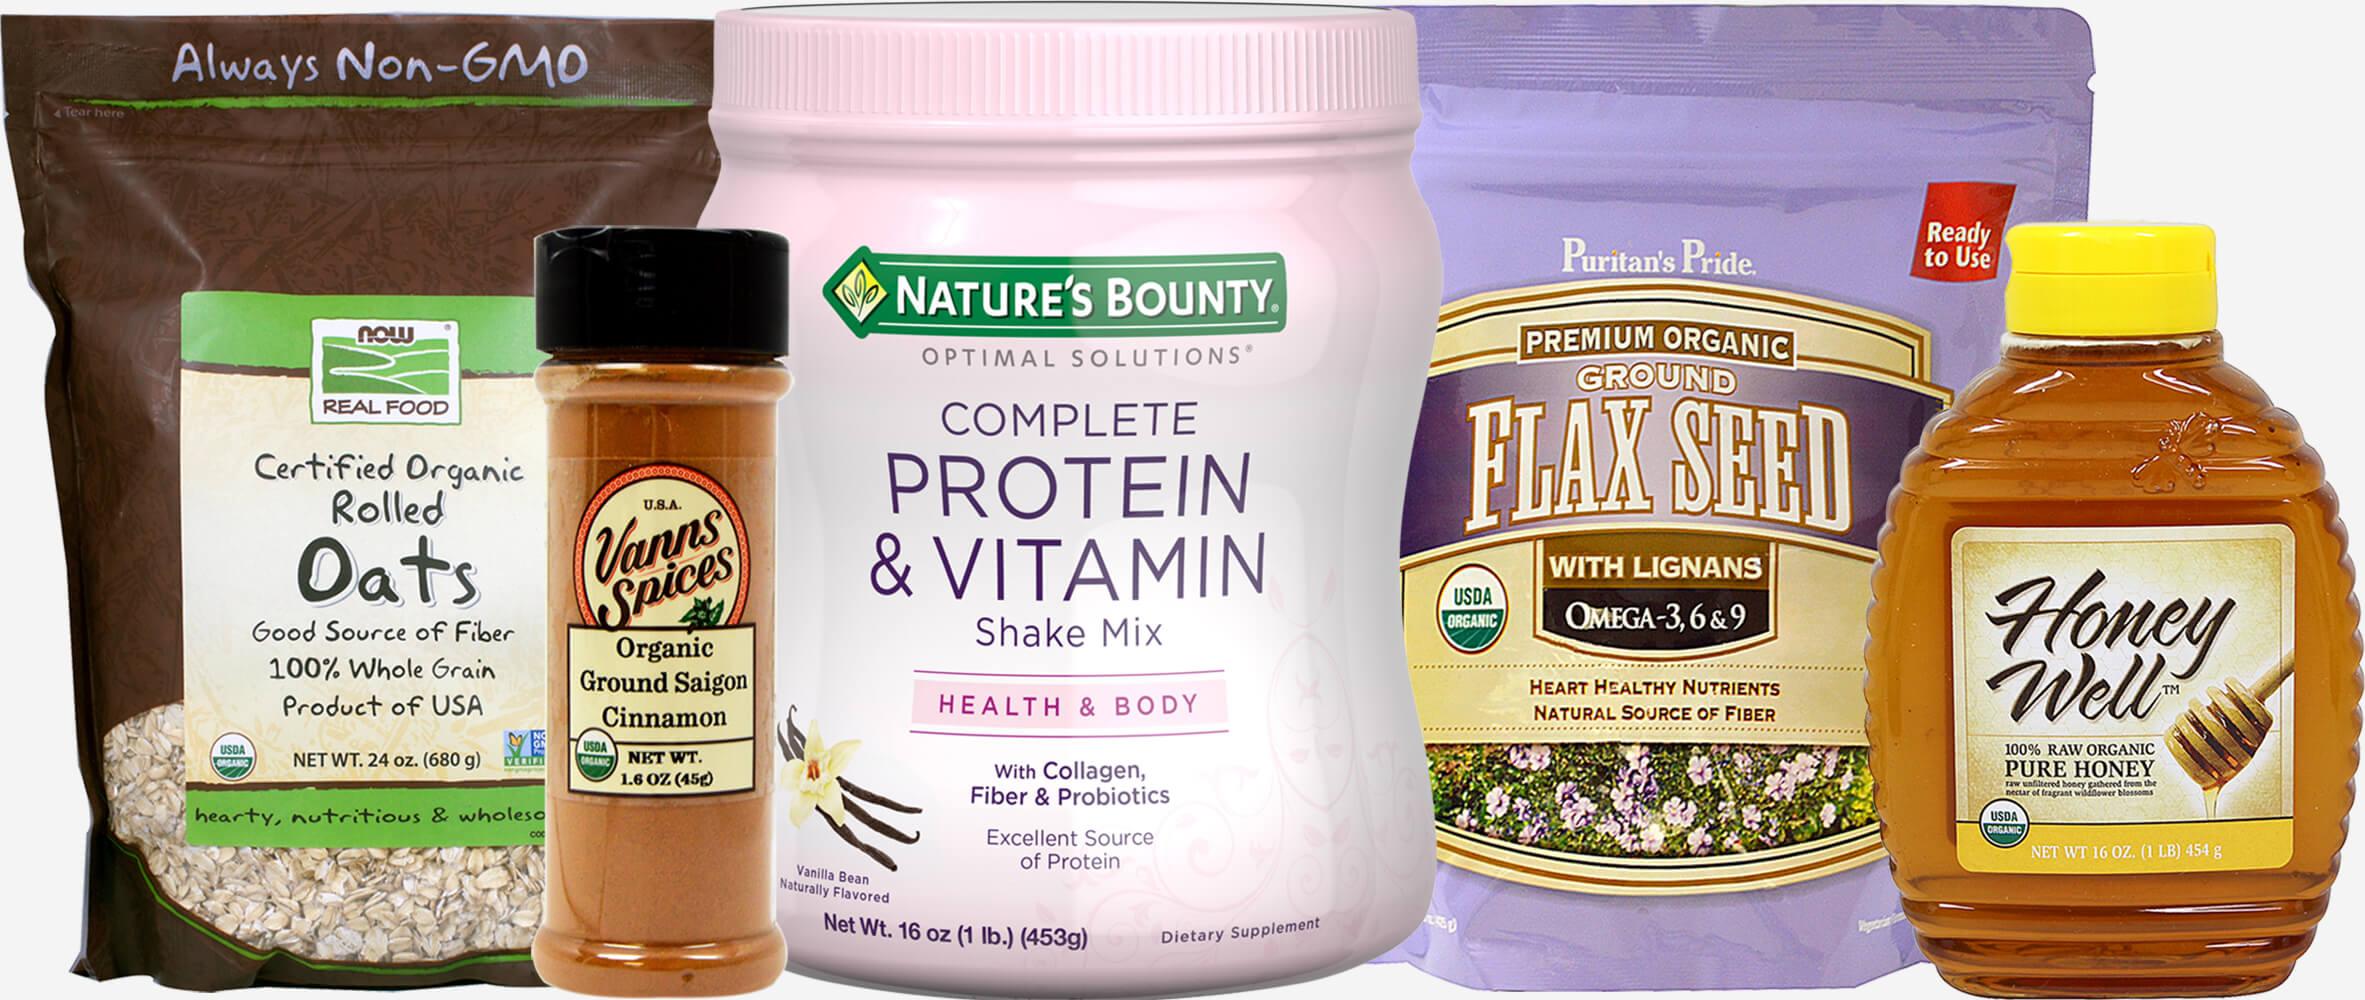 Kit Smoothie Ingredients Vanilla Bundle-5 Pack 021376